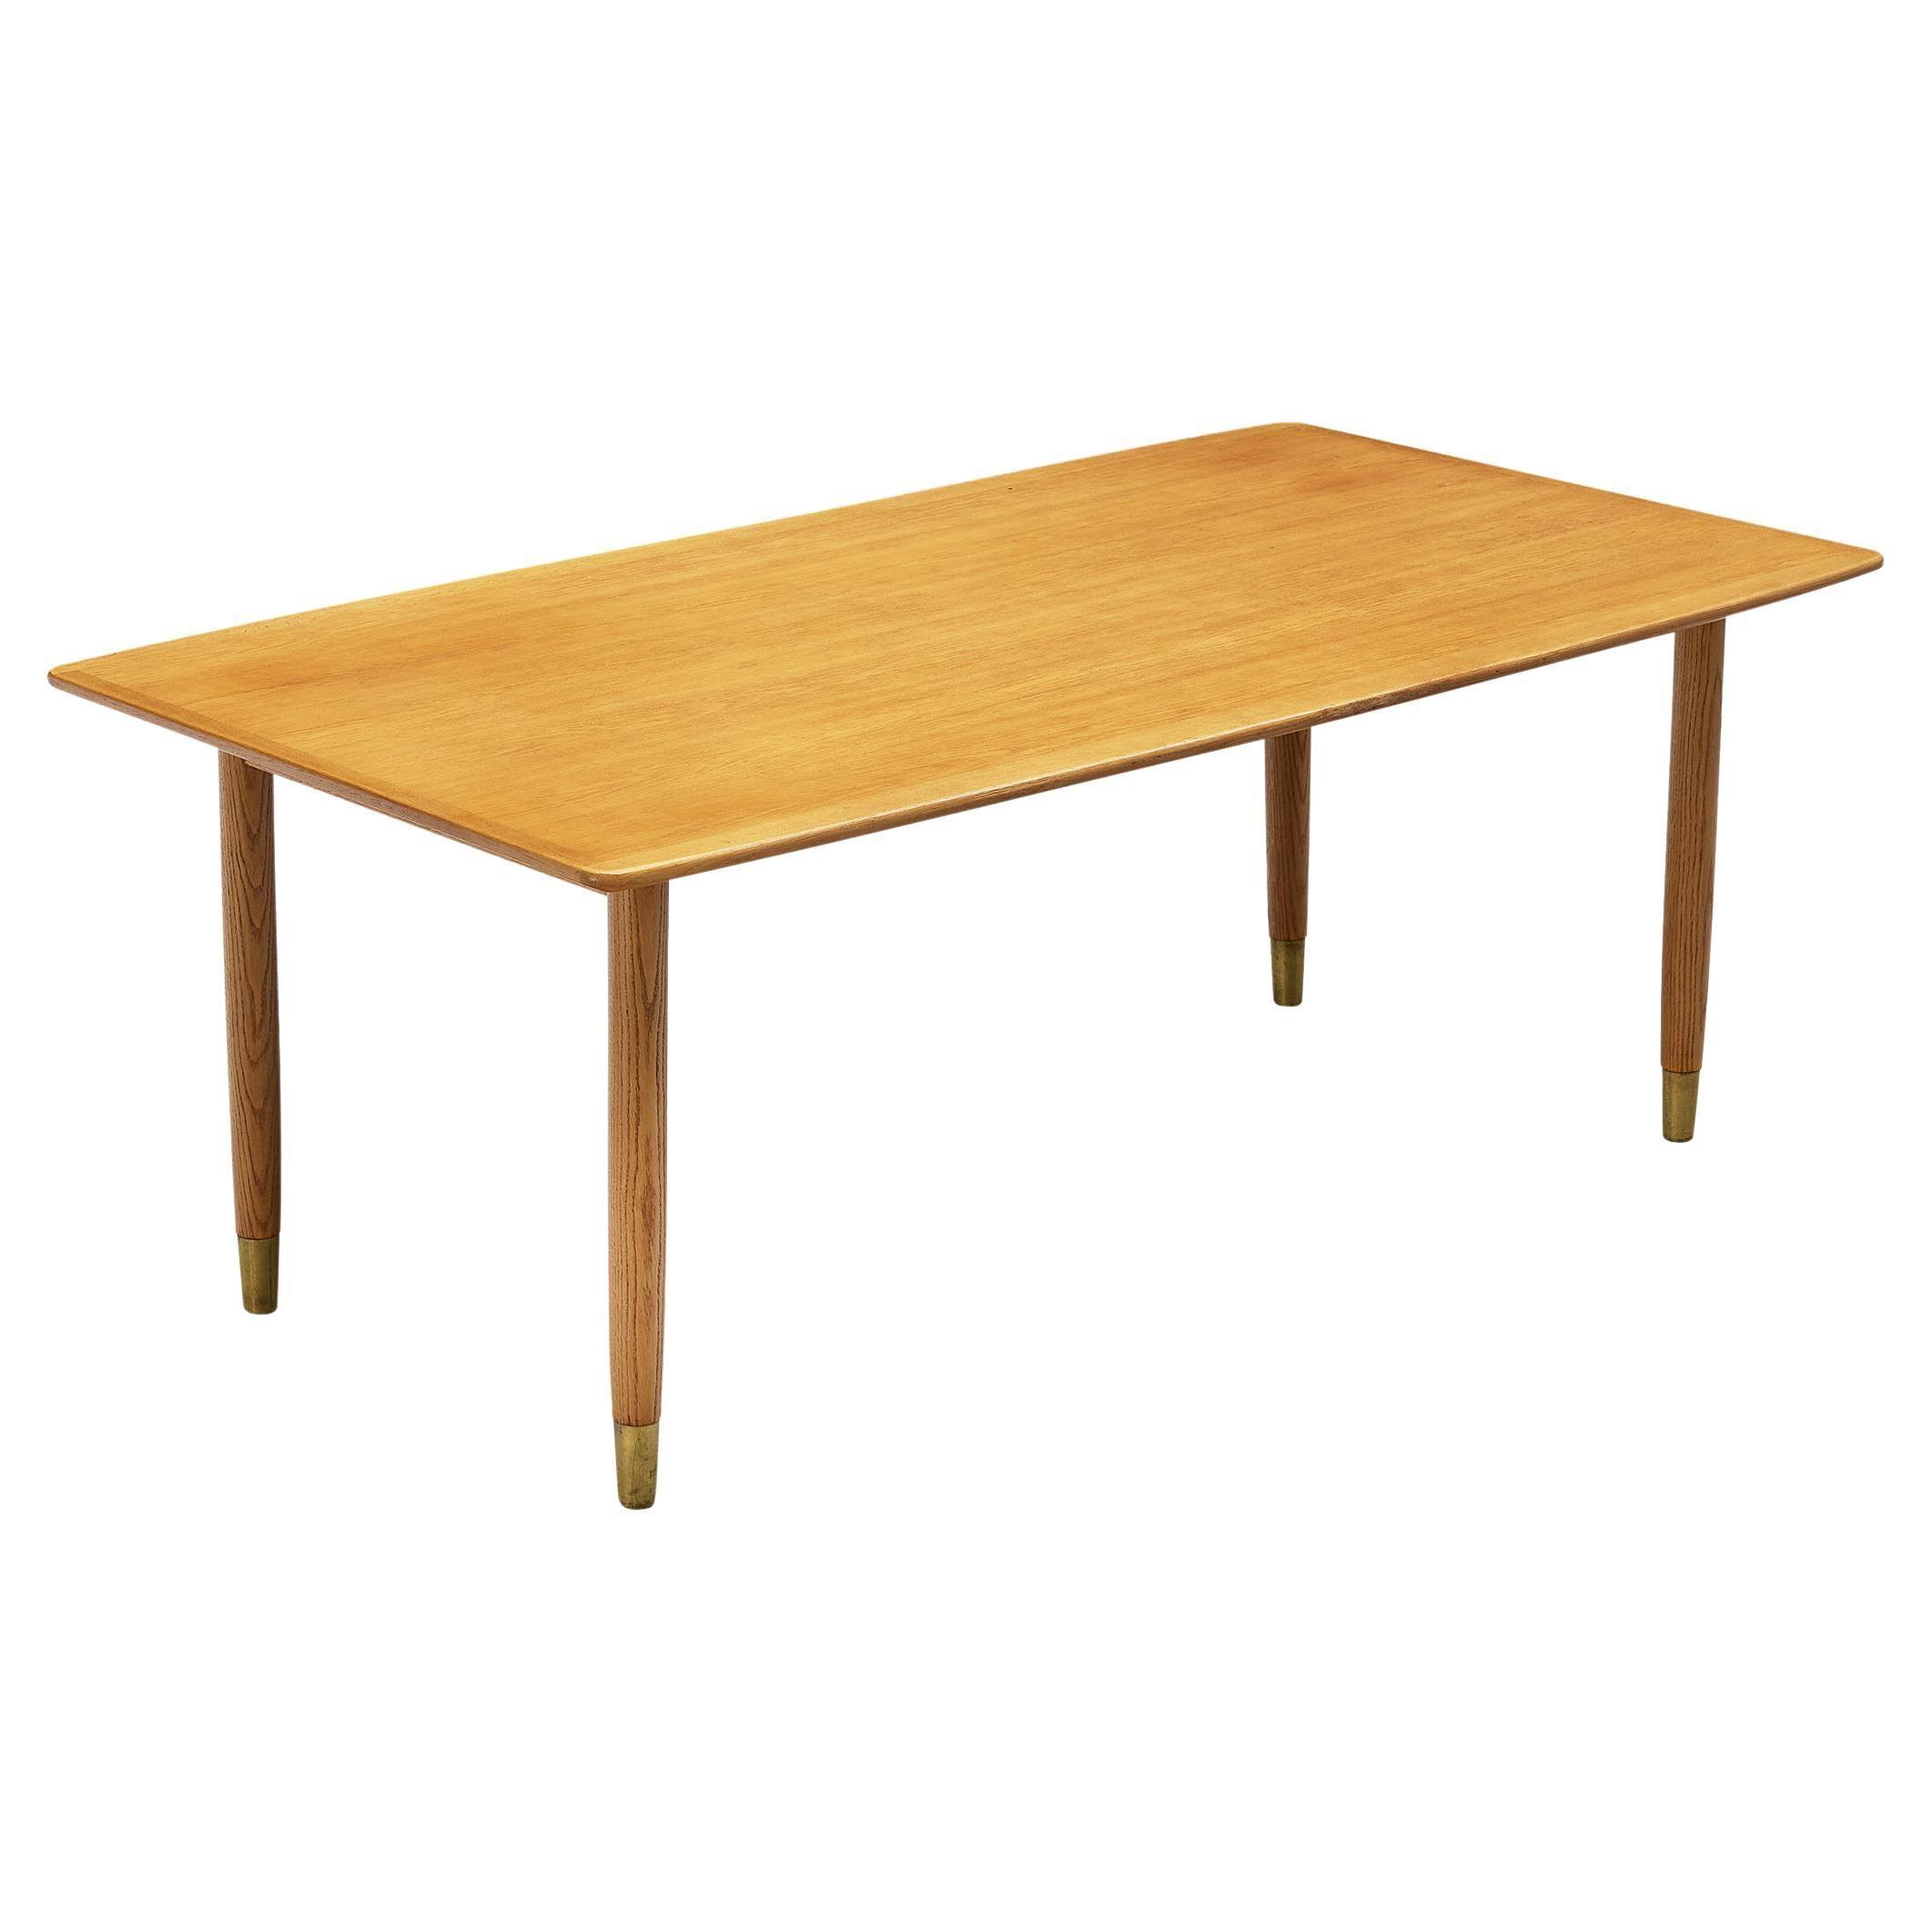 Danish Dining Table in Oak with Brass Feet